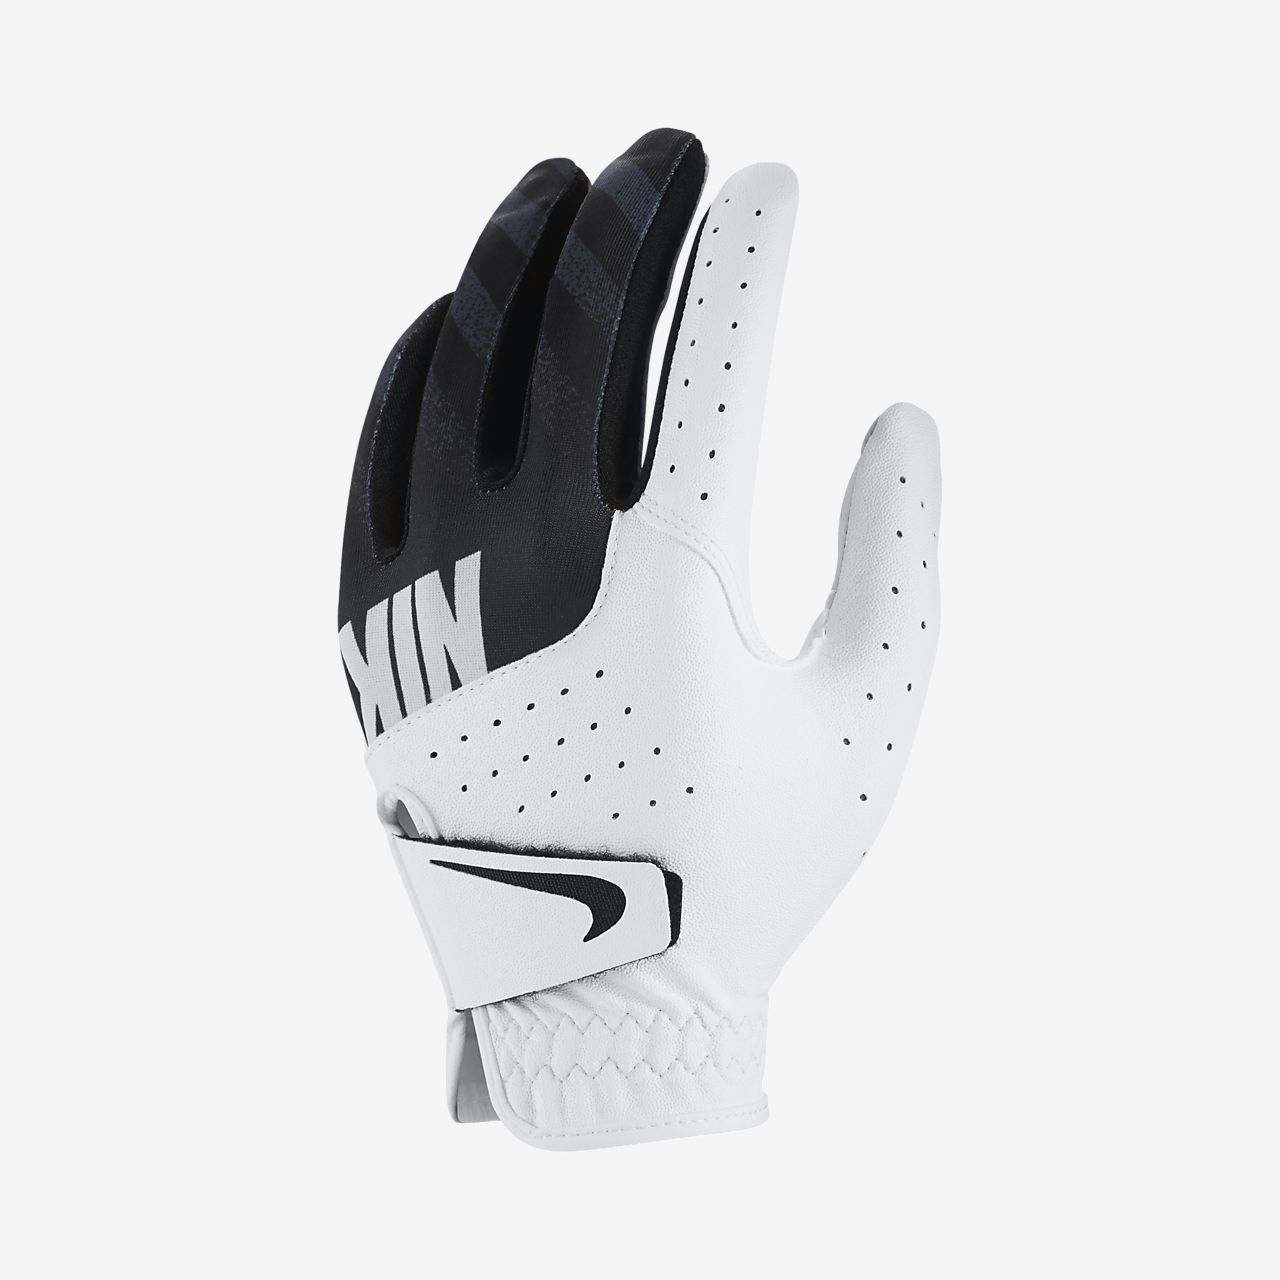 Nike Sport Kinder-Golfhandschuh (Links regulär)